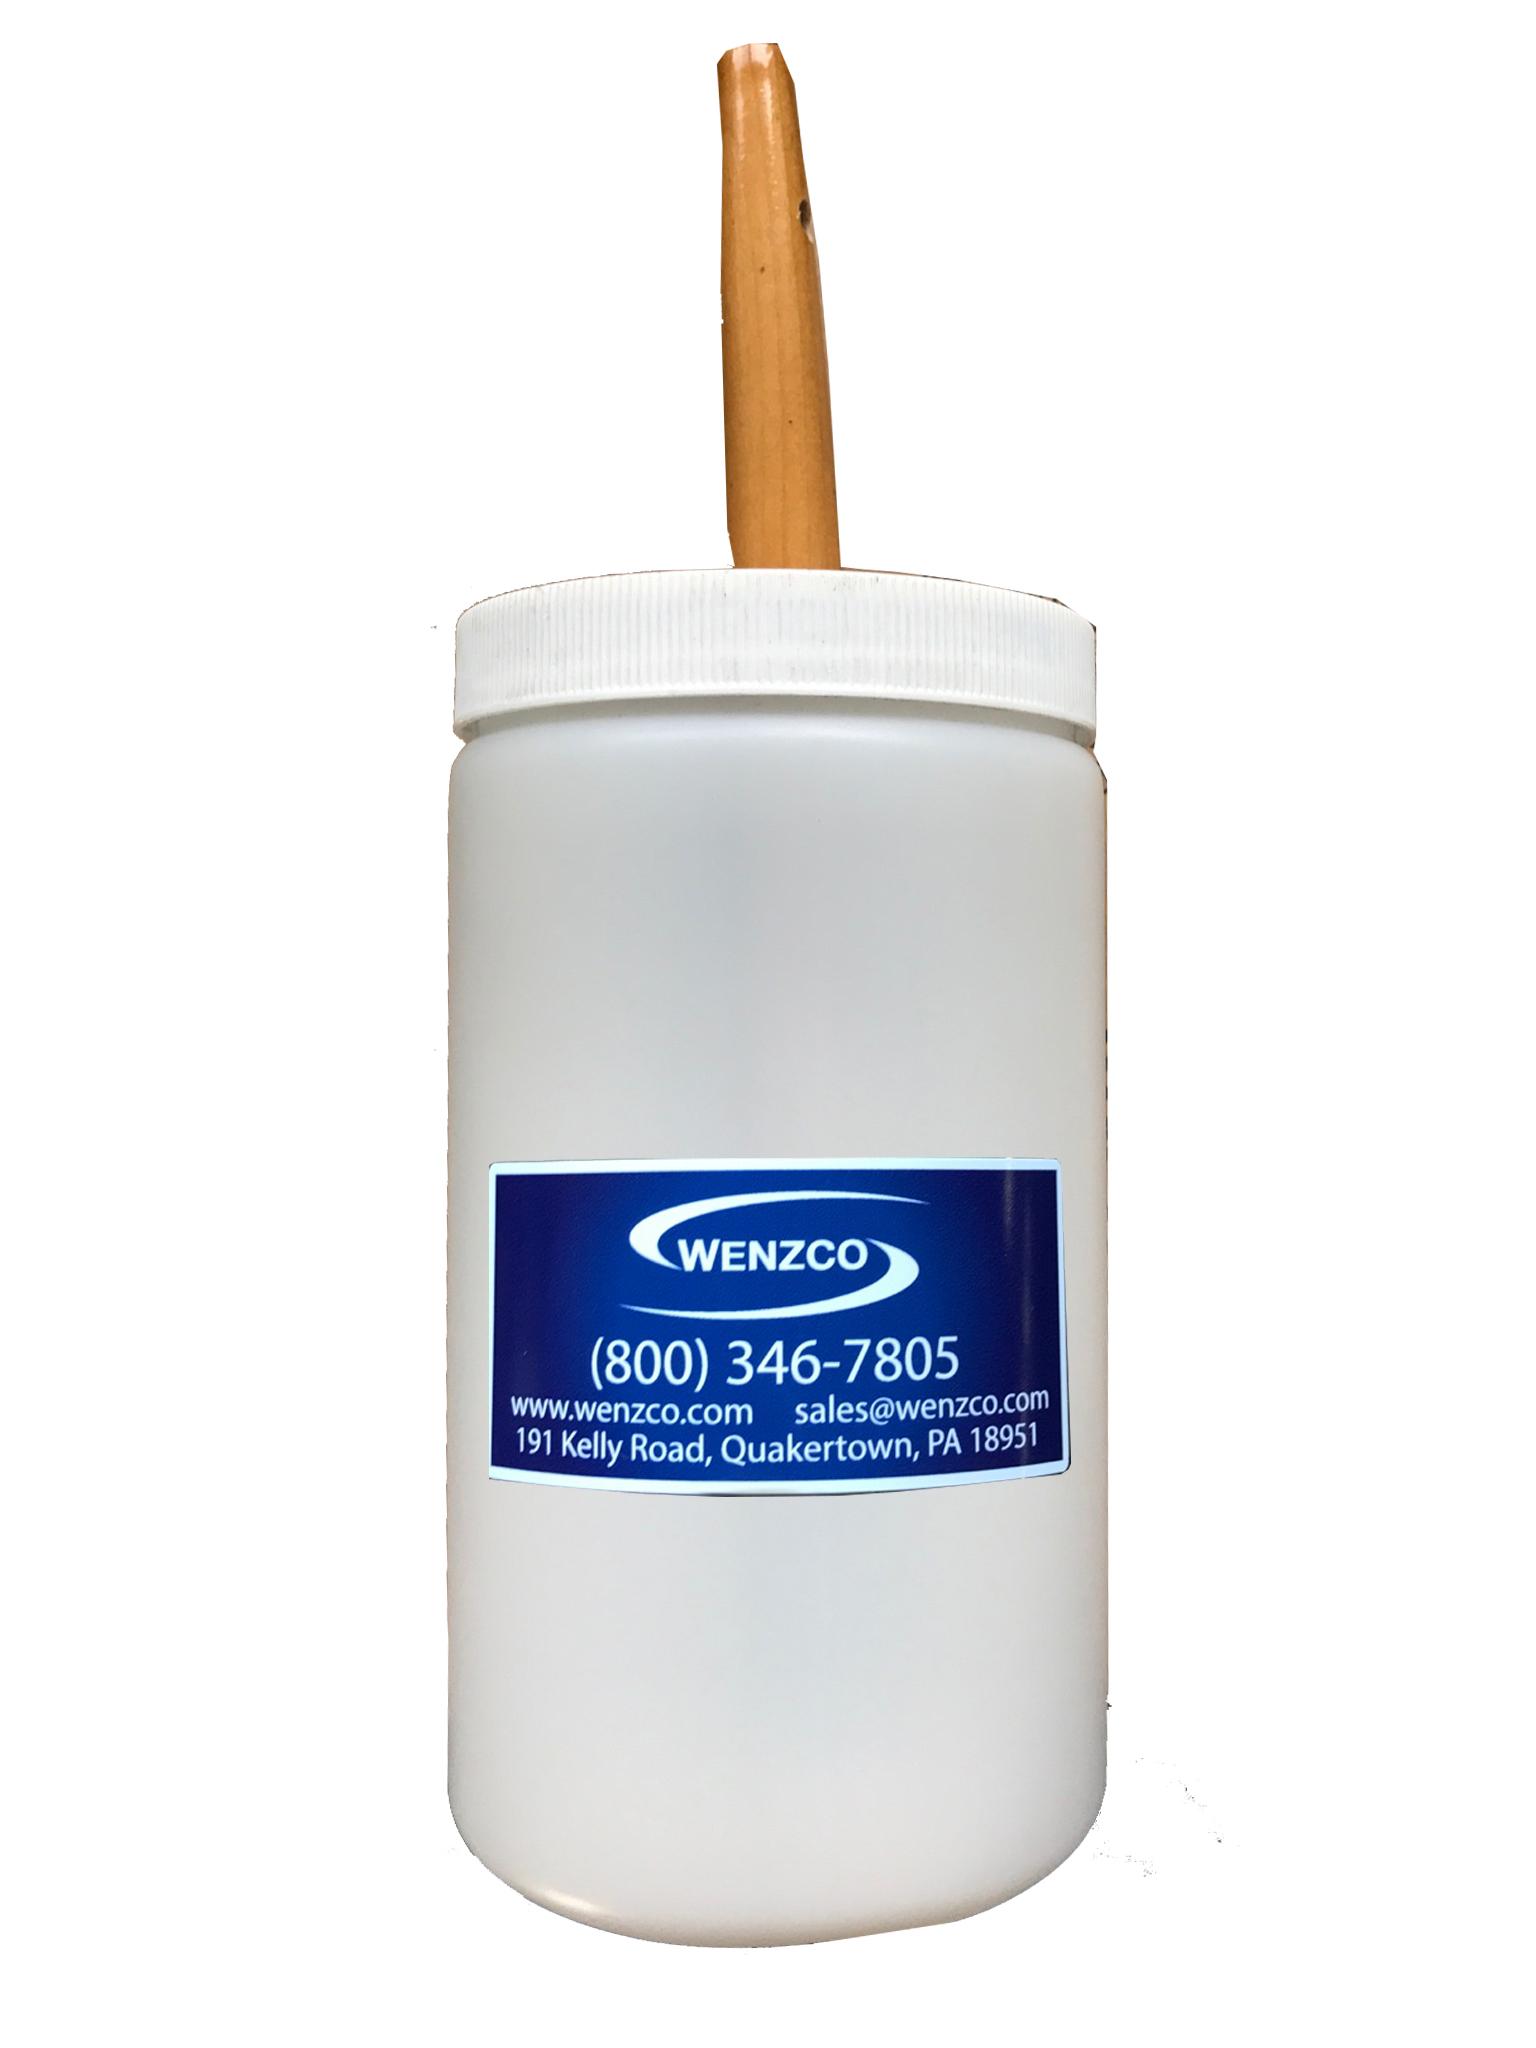 Plastic Filler Jar & Brush